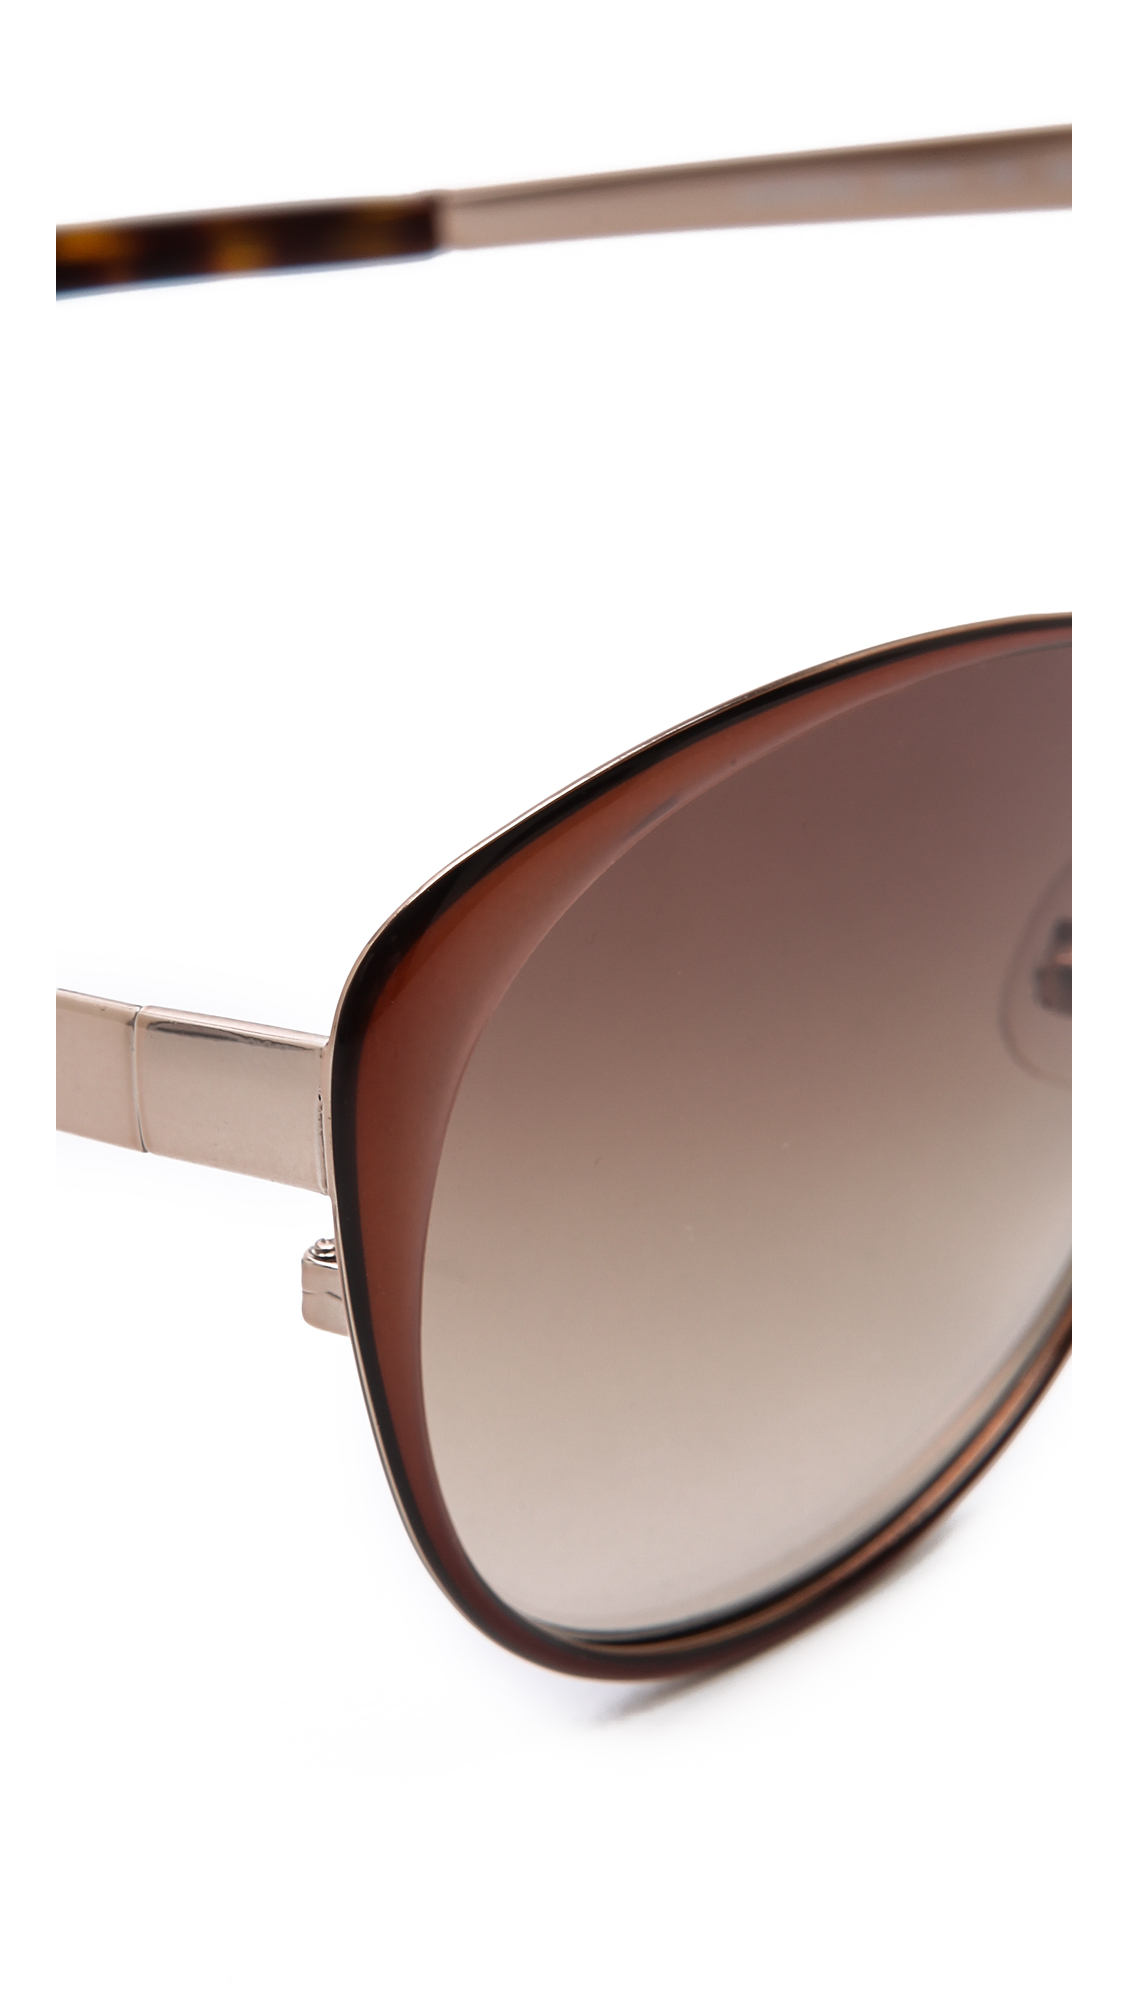 Kate Spade Cassia Sunglasses - Brown/Brown Gradient